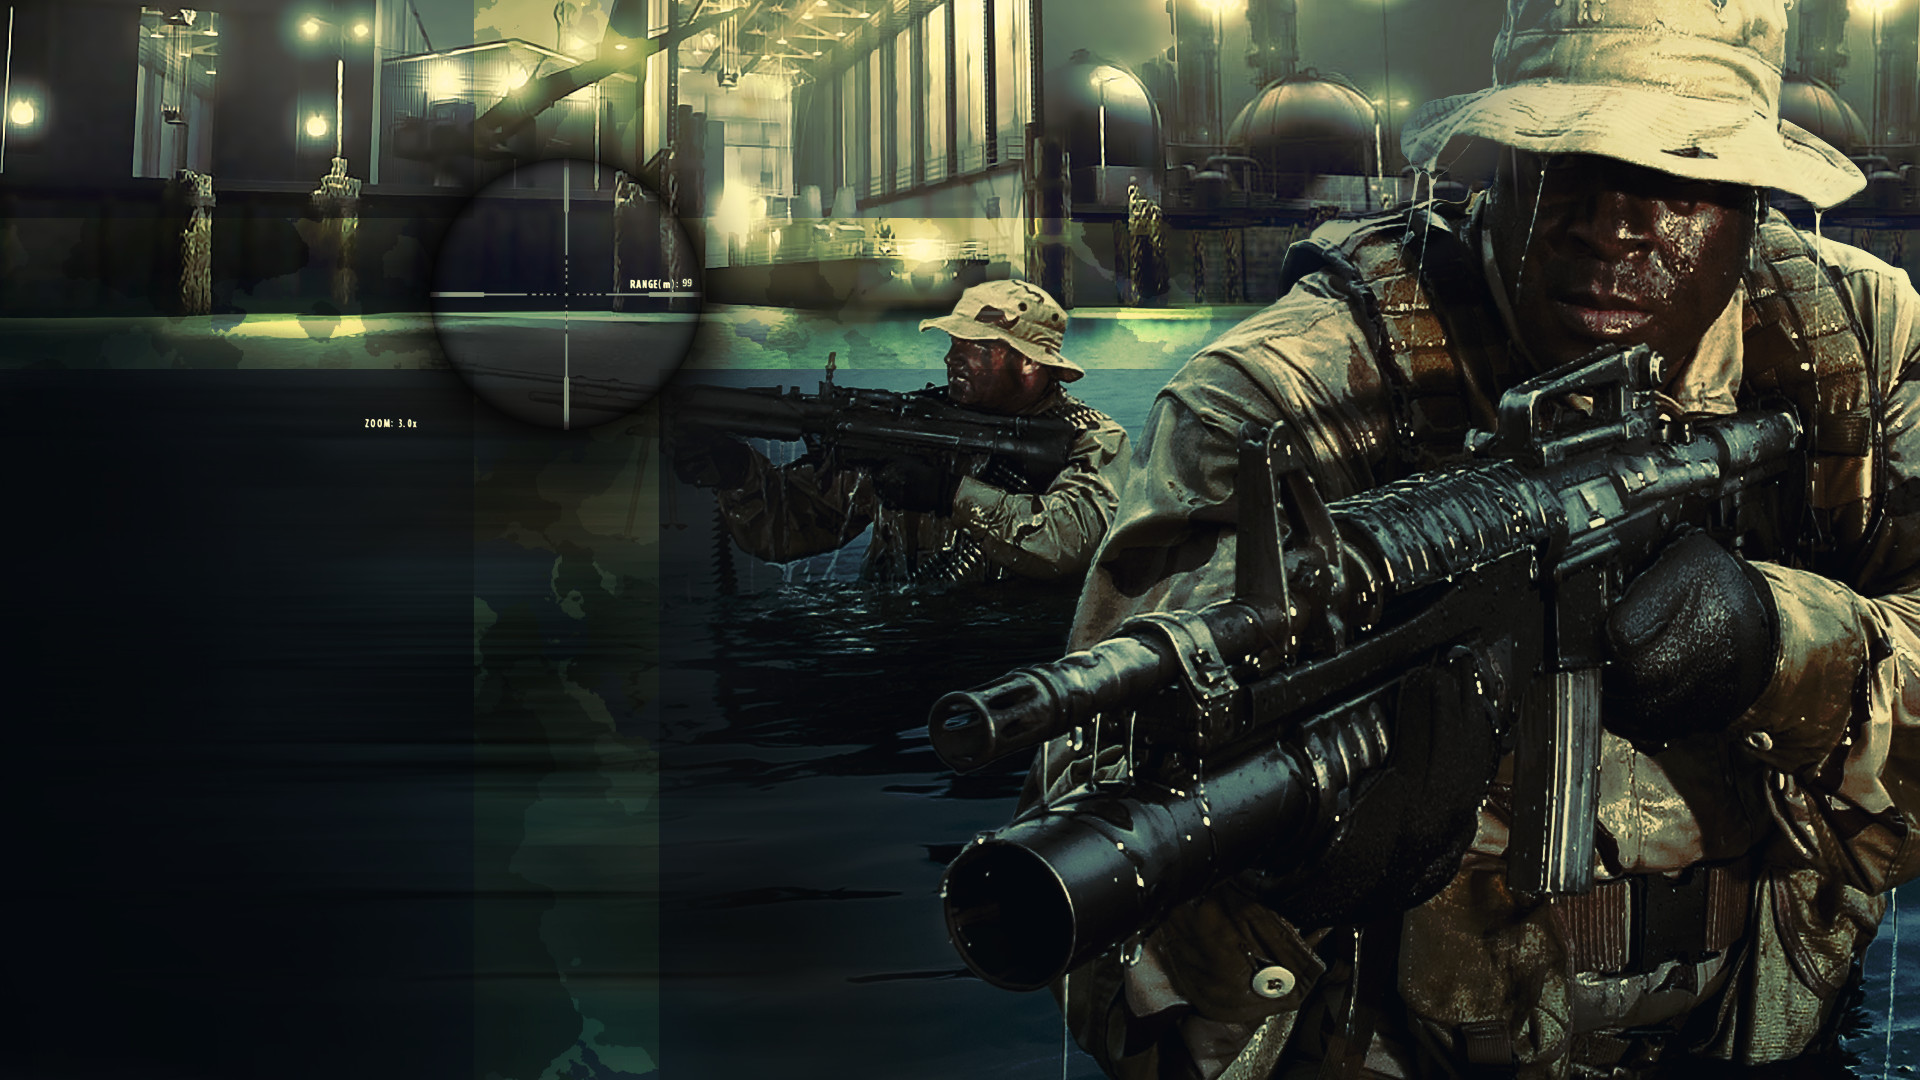 SOCOM 2 Bravo Wallpaper – More Navy SEALs close-ups including in .